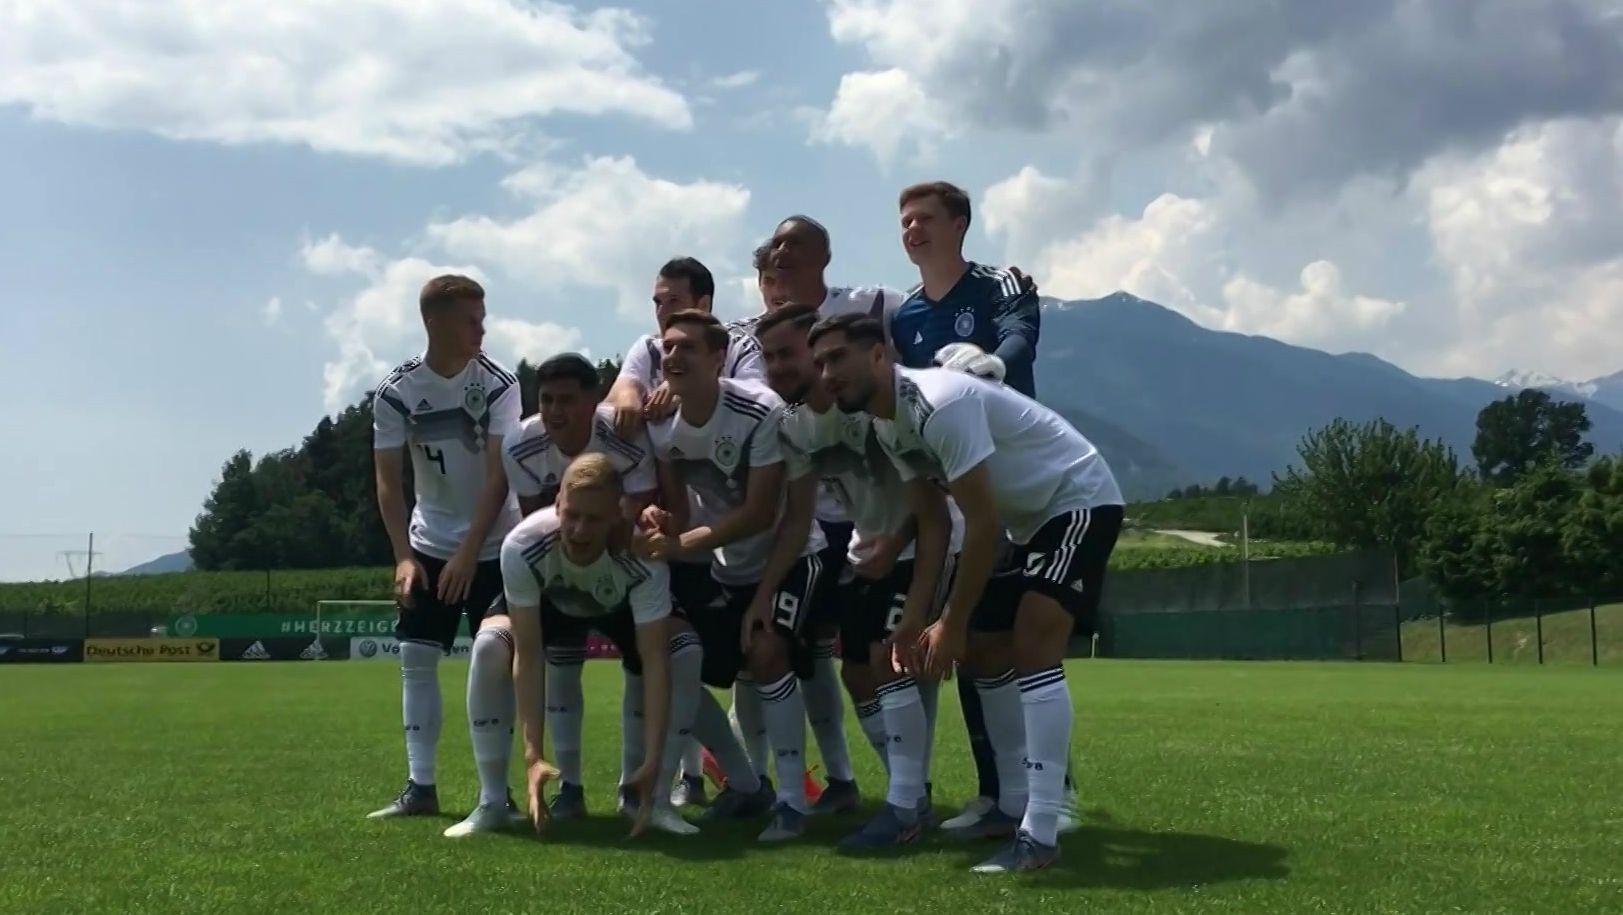 U21-Nationalmannschaft im Trainingslager in Südtirol